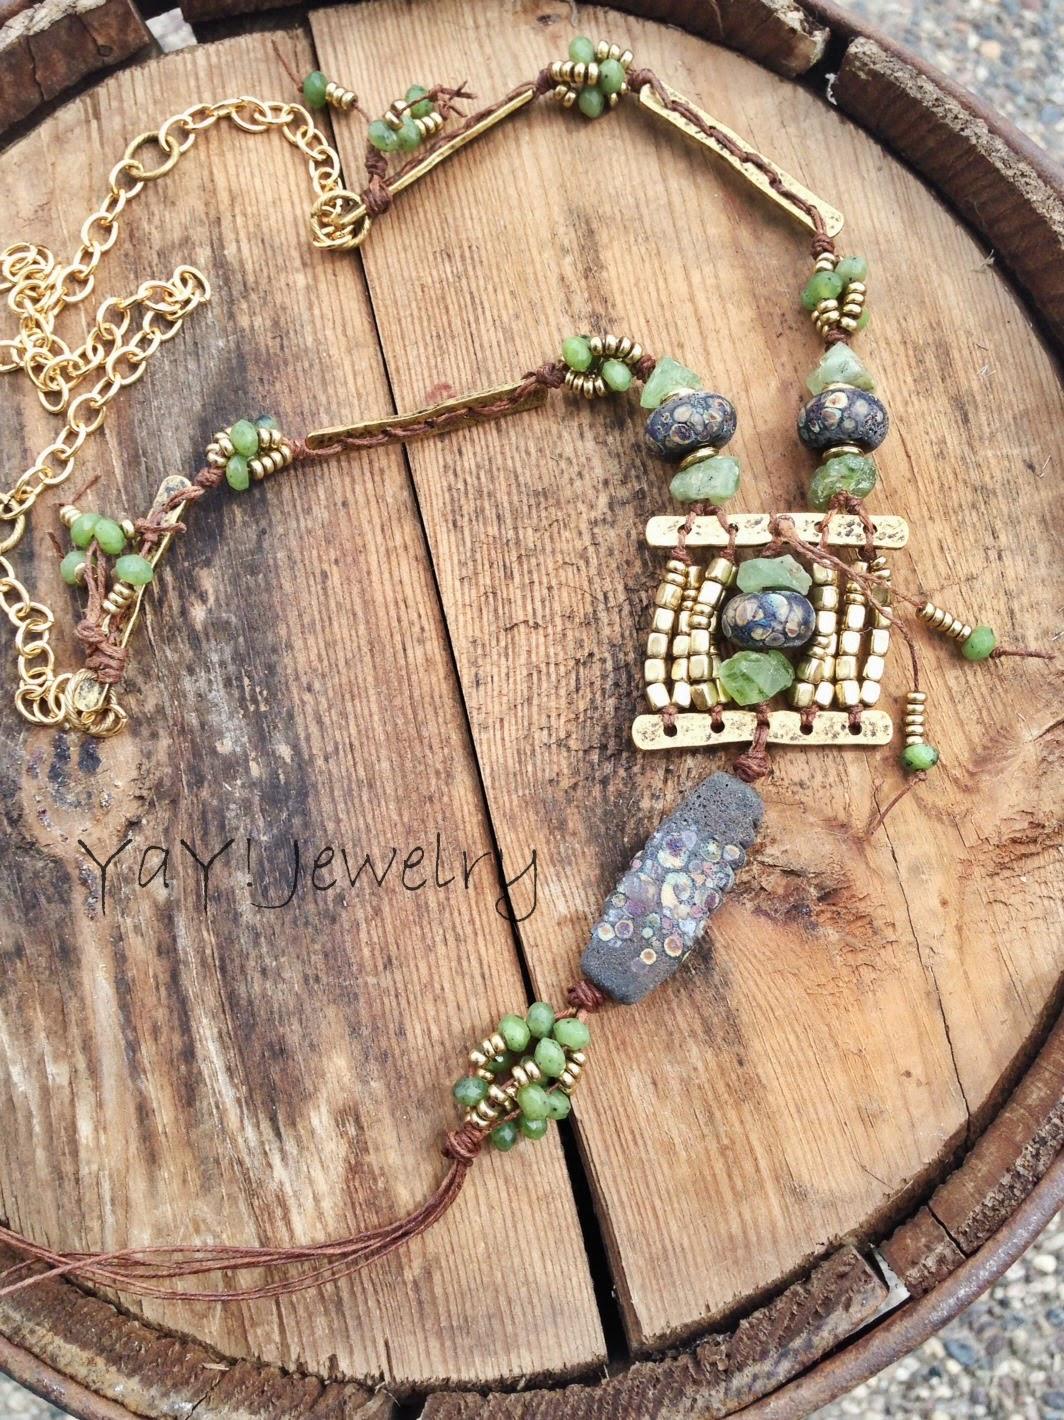 Yay jewelry belle armoire jewelry magazine kristin for Belle armoire jewelry magazine subscription